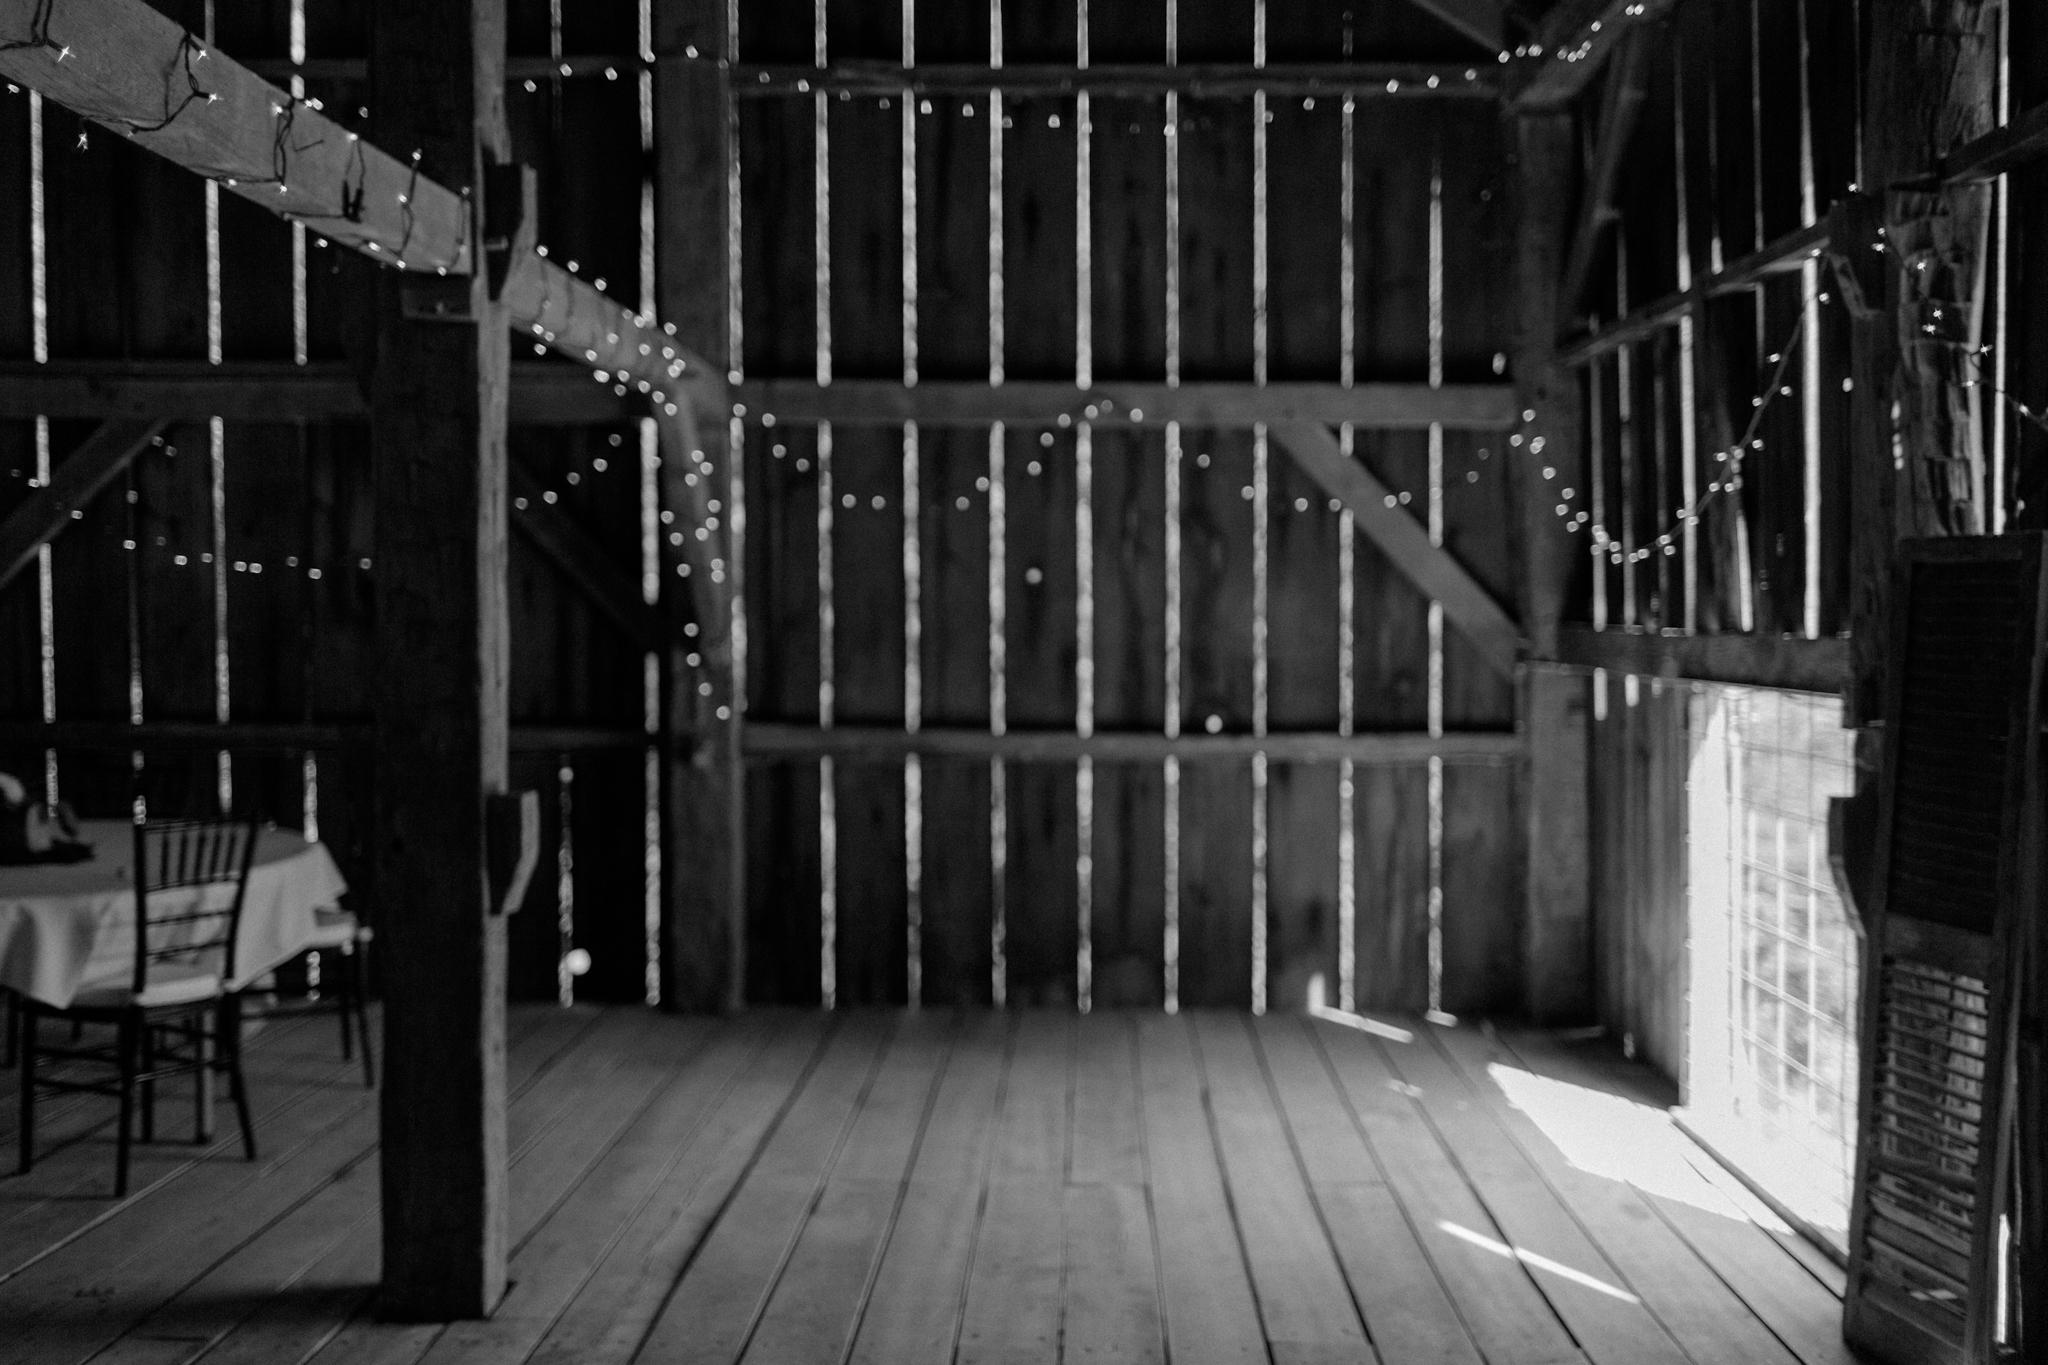 canyon run ranch wedding bohemian wedding photographer ohio bohemian wedding dayton ohio wedding photographer columbus ohio wedding photographer cincinnati ohio wedding photographer sarah rose